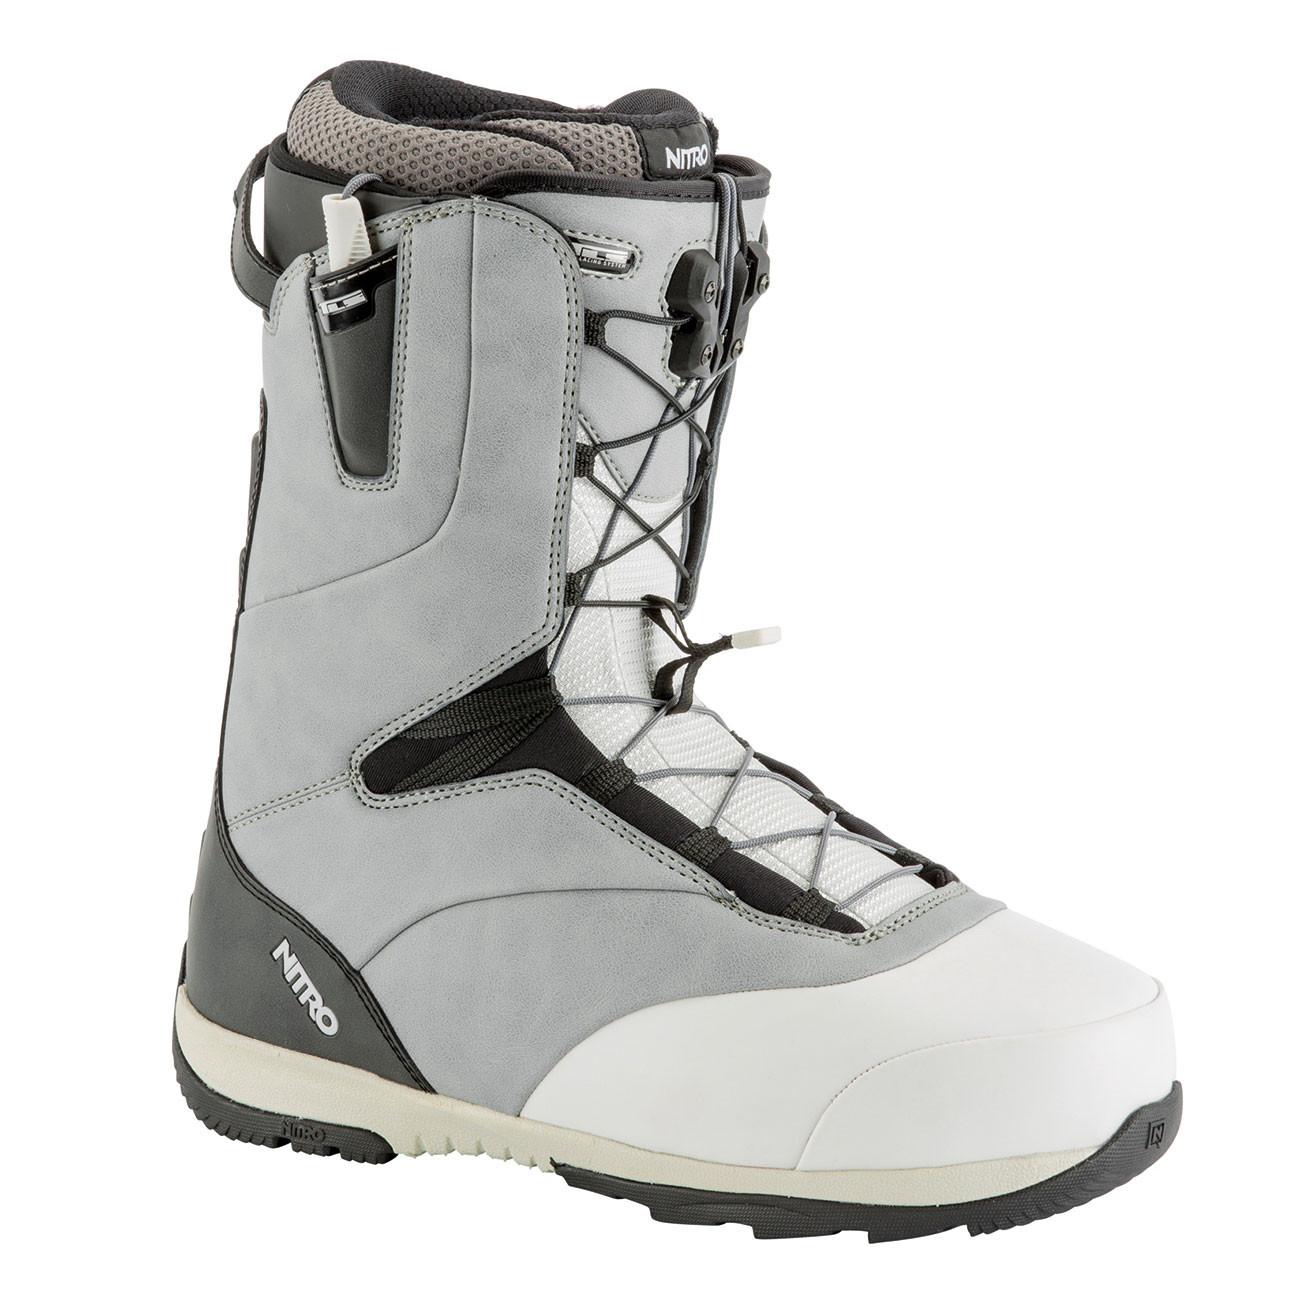 Boty Nitro Venture Tls grey white black  4d682a9b6d